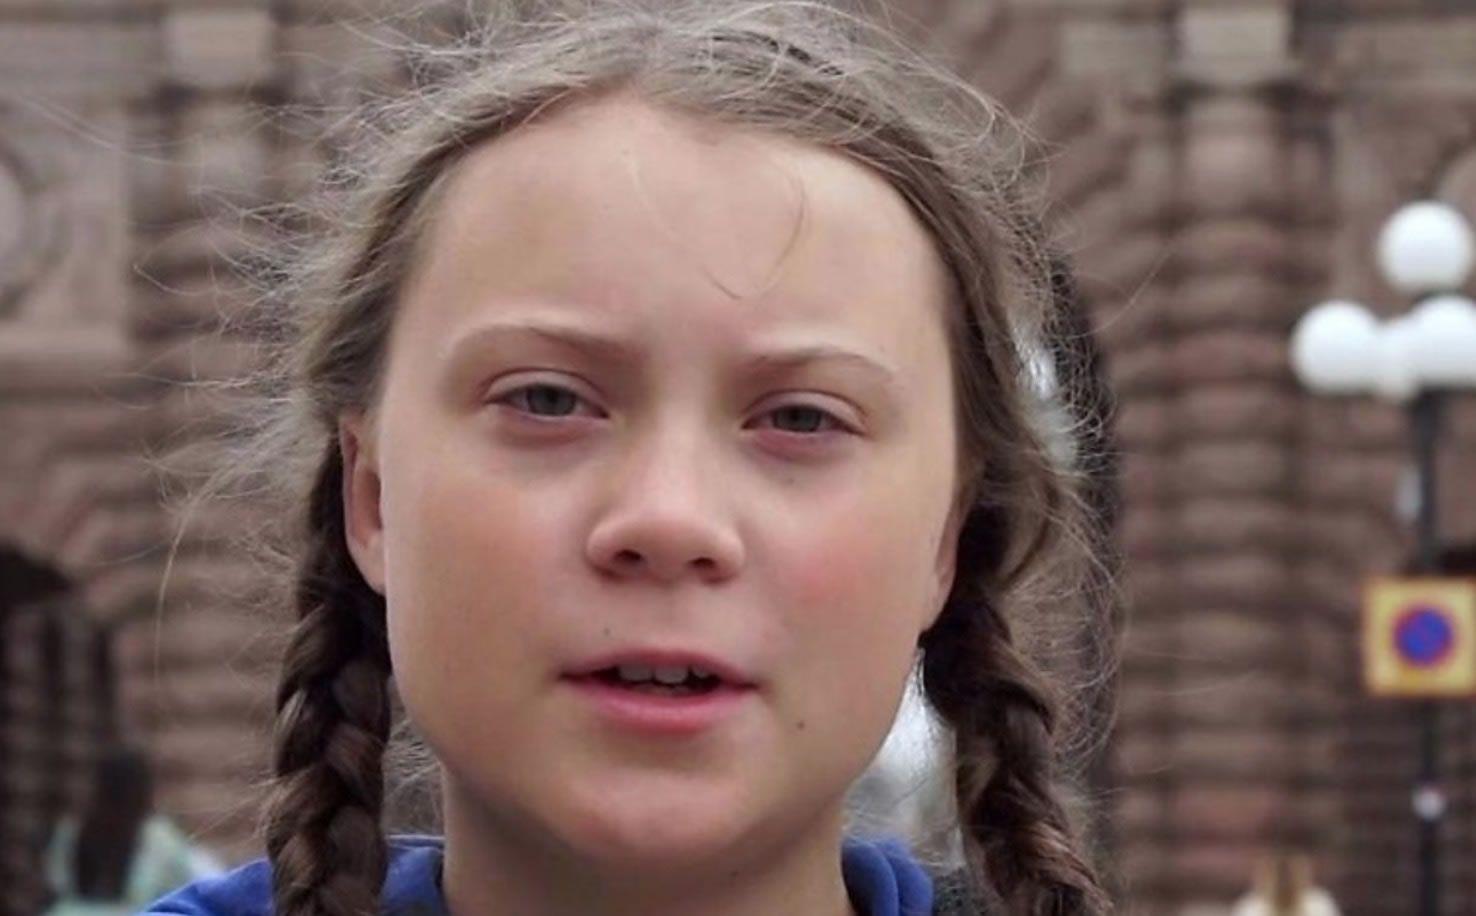 Greta Thunberg: The Swedish teen inspiring climate strikes